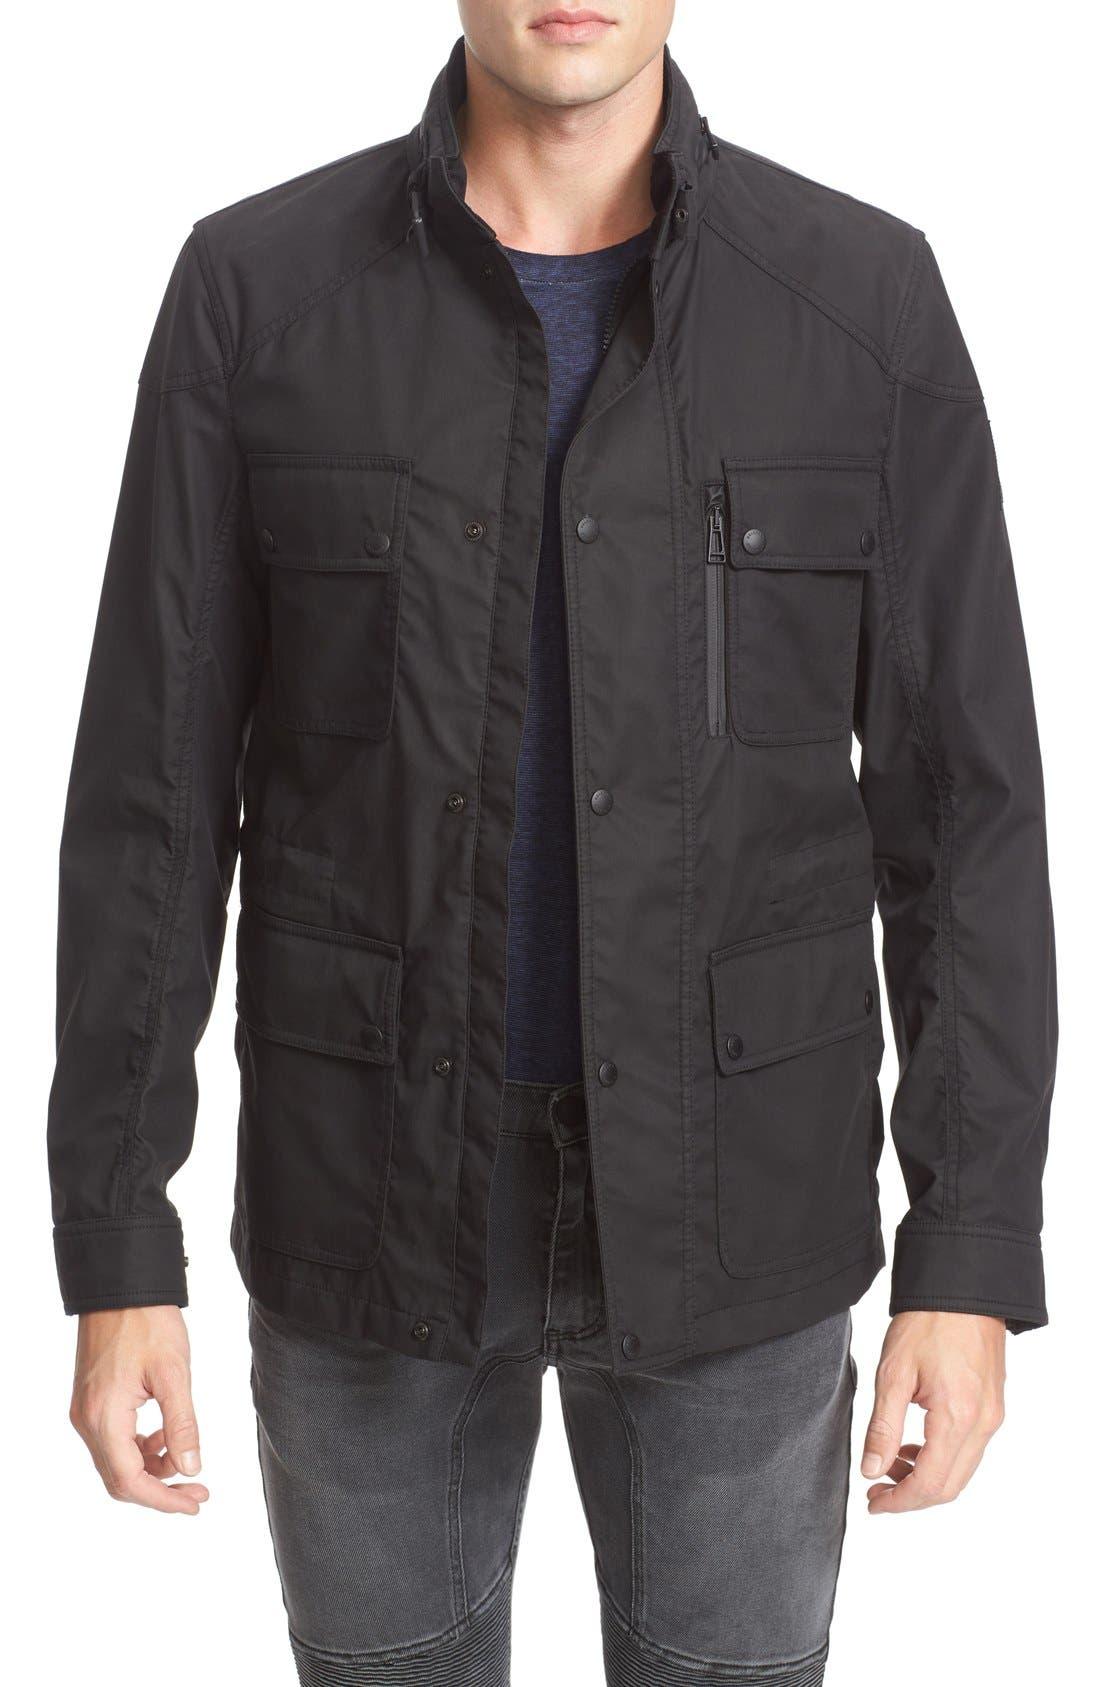 BELSTAFF Trailmaster Staywax Jacket, Main, color, 001